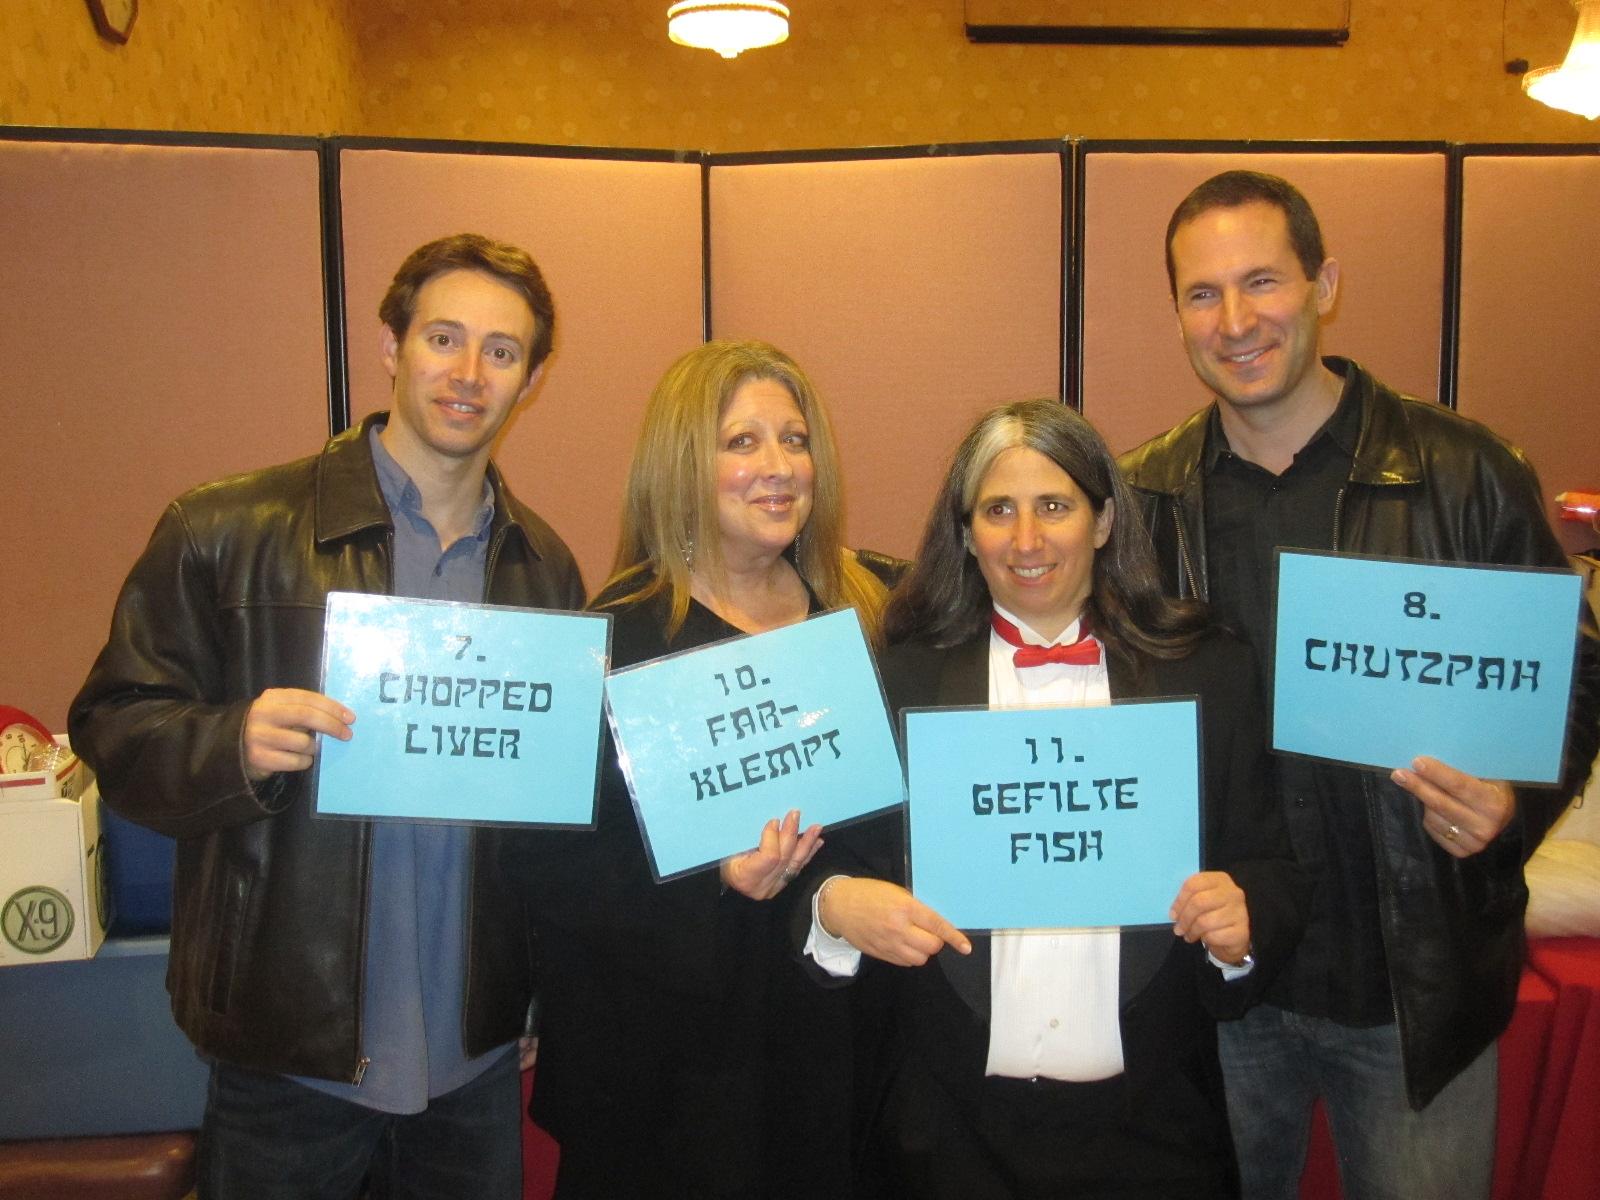 Avi Liberman, Elayne Boosler, Lisa Geduldig, Jeff Applebaum, 2011